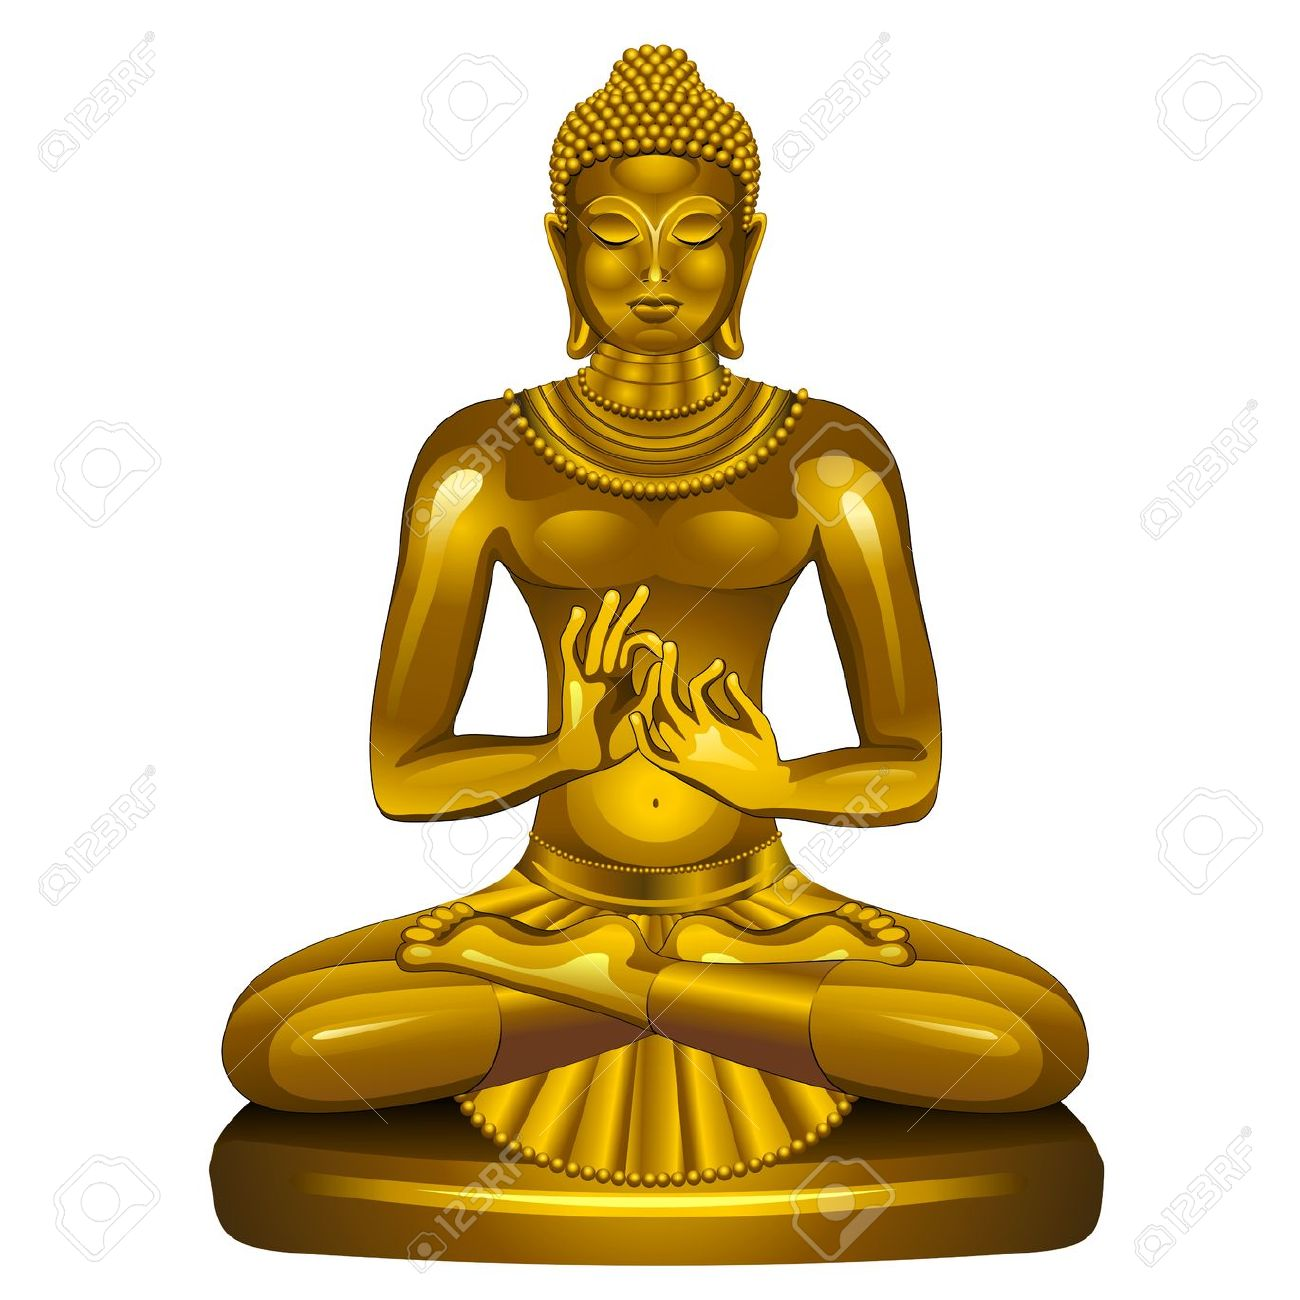 Gautam buddha live clipart.